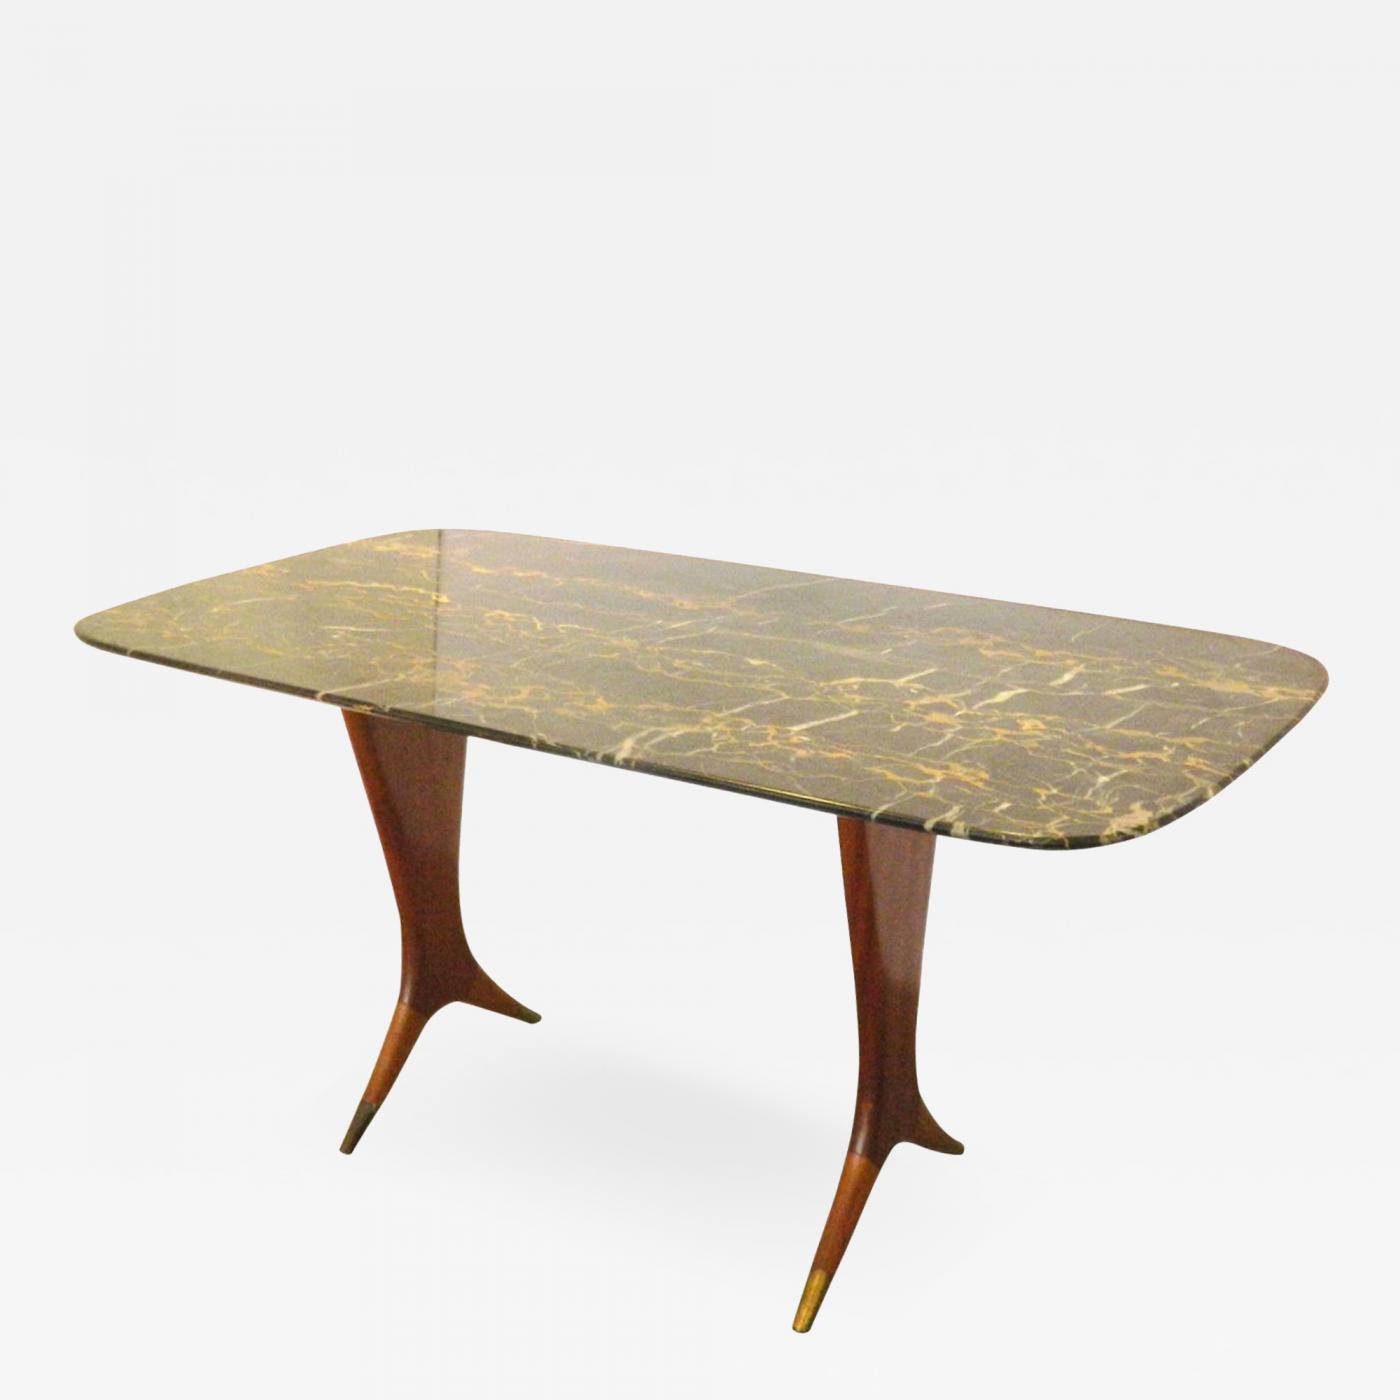 Guglielmo Ulrich Italian Mid Century Modern Coffee Table In The Style Of Guglielmo Ulrich